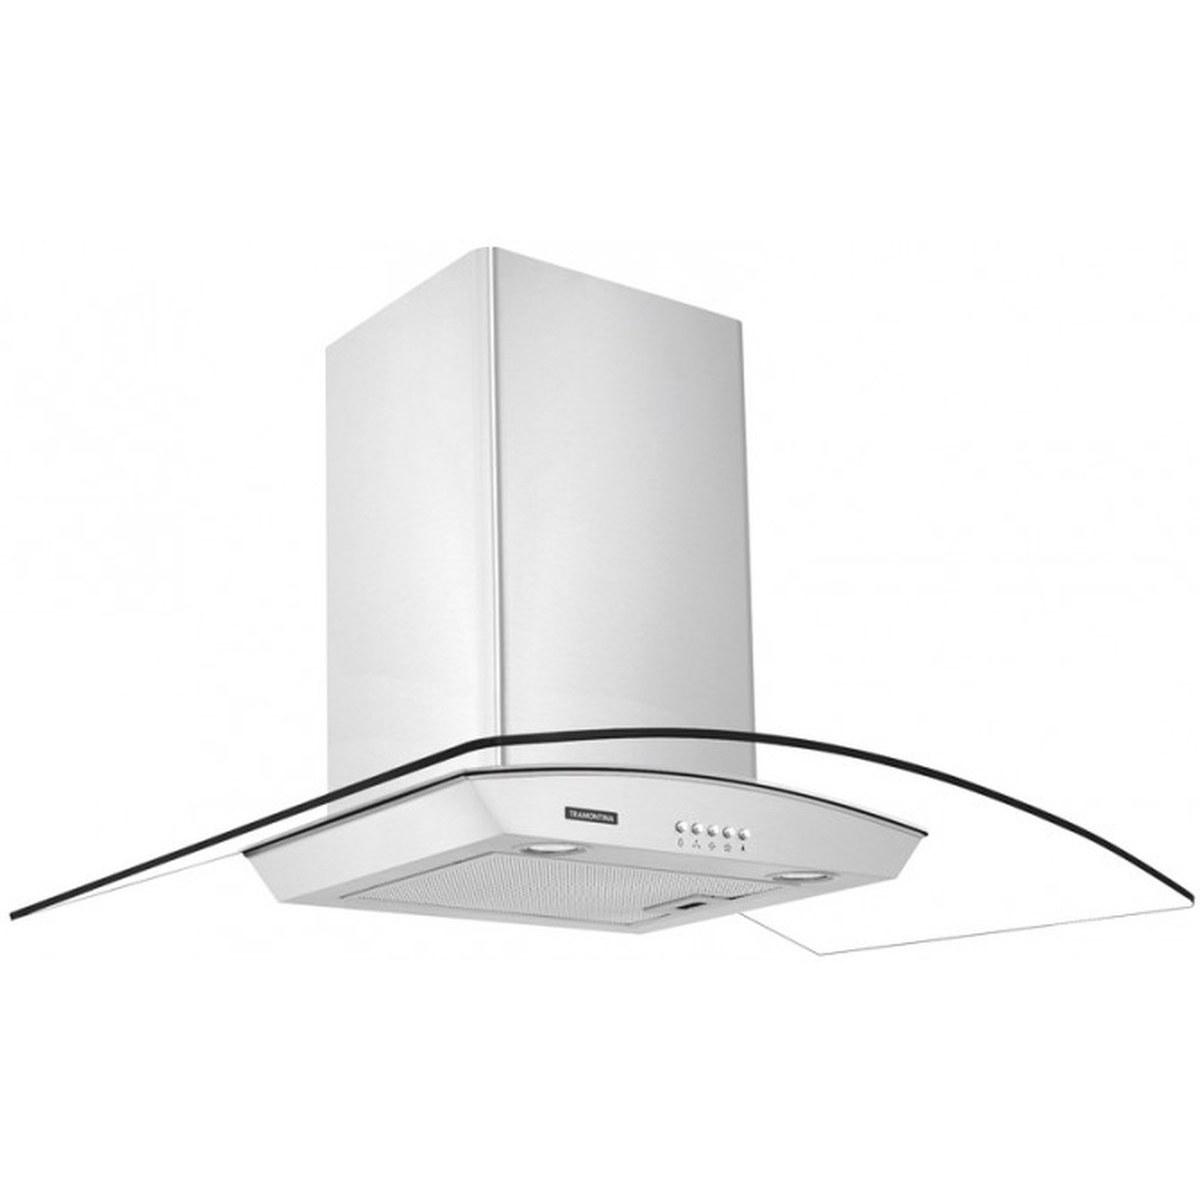 Coifa Inox/vidro Vetro 90 127V 94805/110 Tramontina